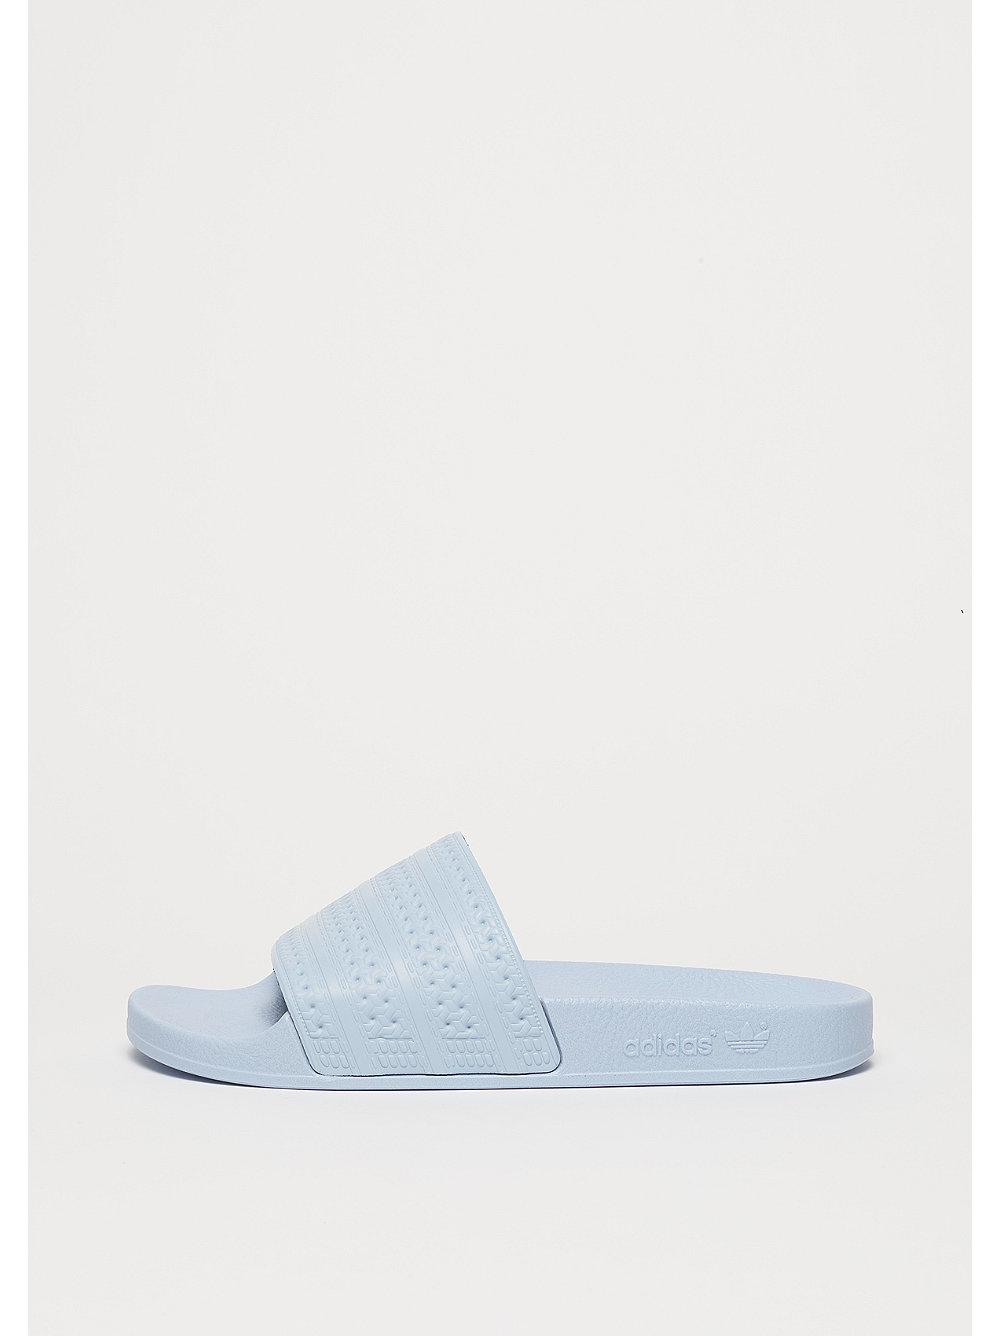 adidas Adilette easy blue-easy blue-easy blue